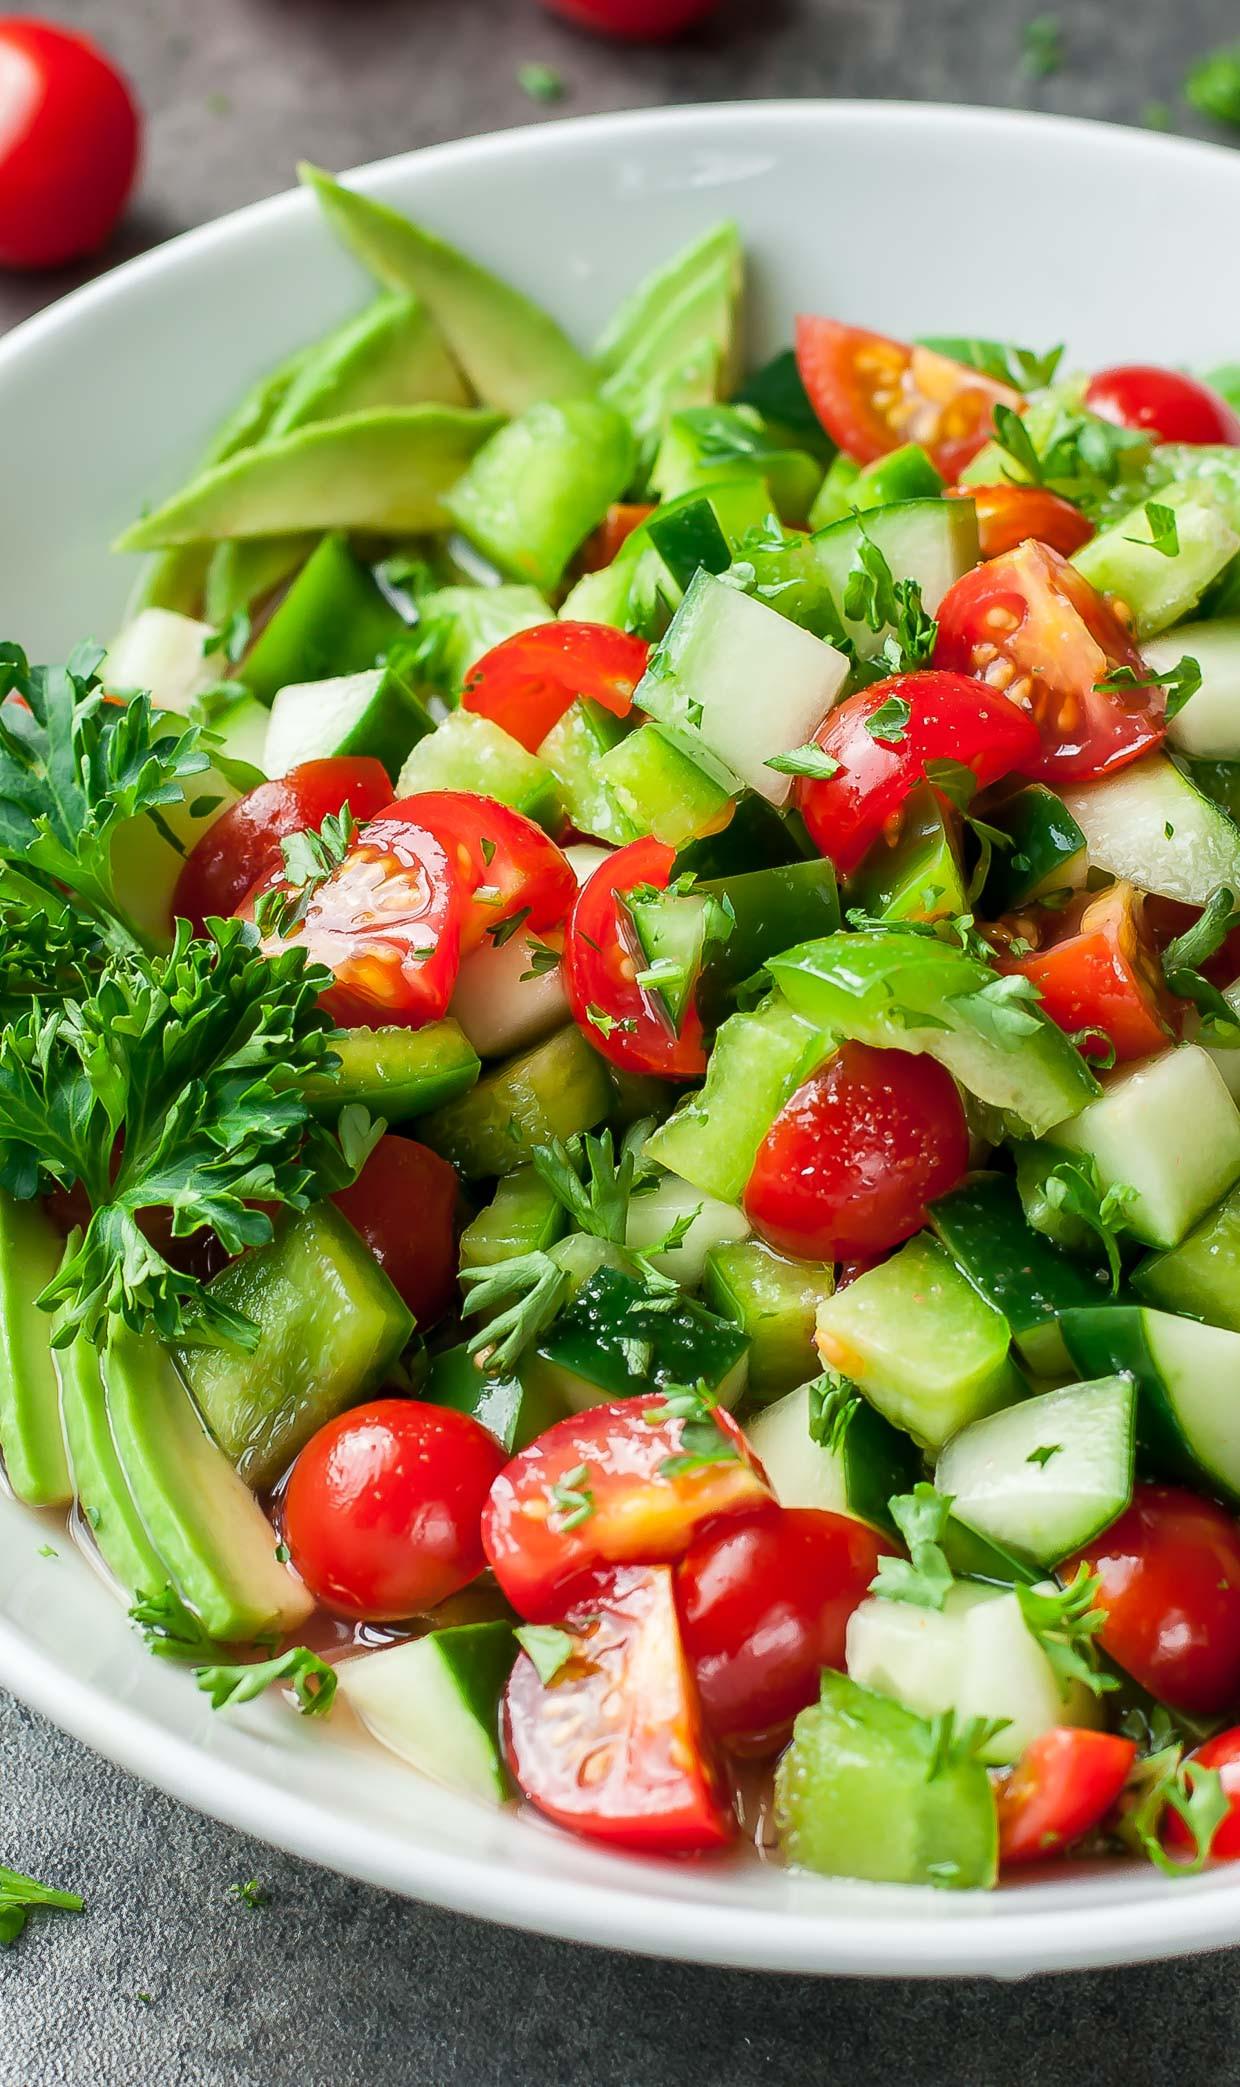 Cucumber Tomato Salad Recipe  Healthy Tomato Cucumber Salad Recipe Peas and Crayons